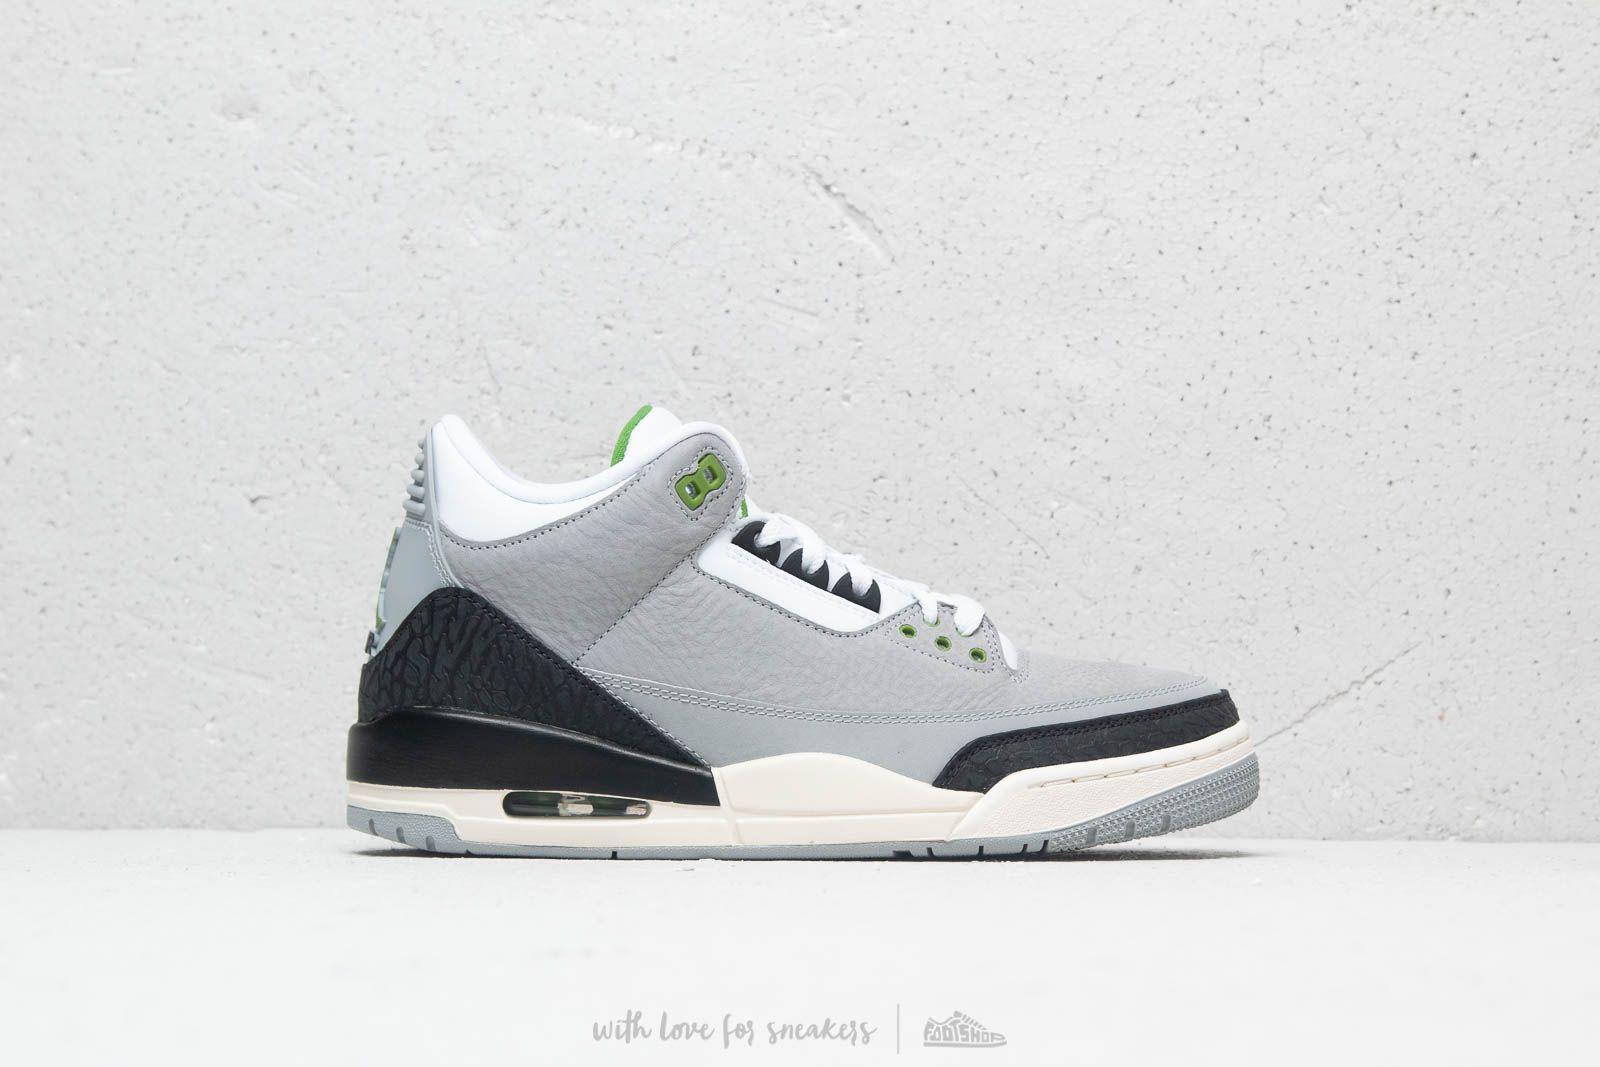 84c7ea825f5 Air Jordan 3 Retro Lt Smoke Grey  Chlorophyll a muy buen precio 192 €  comprar